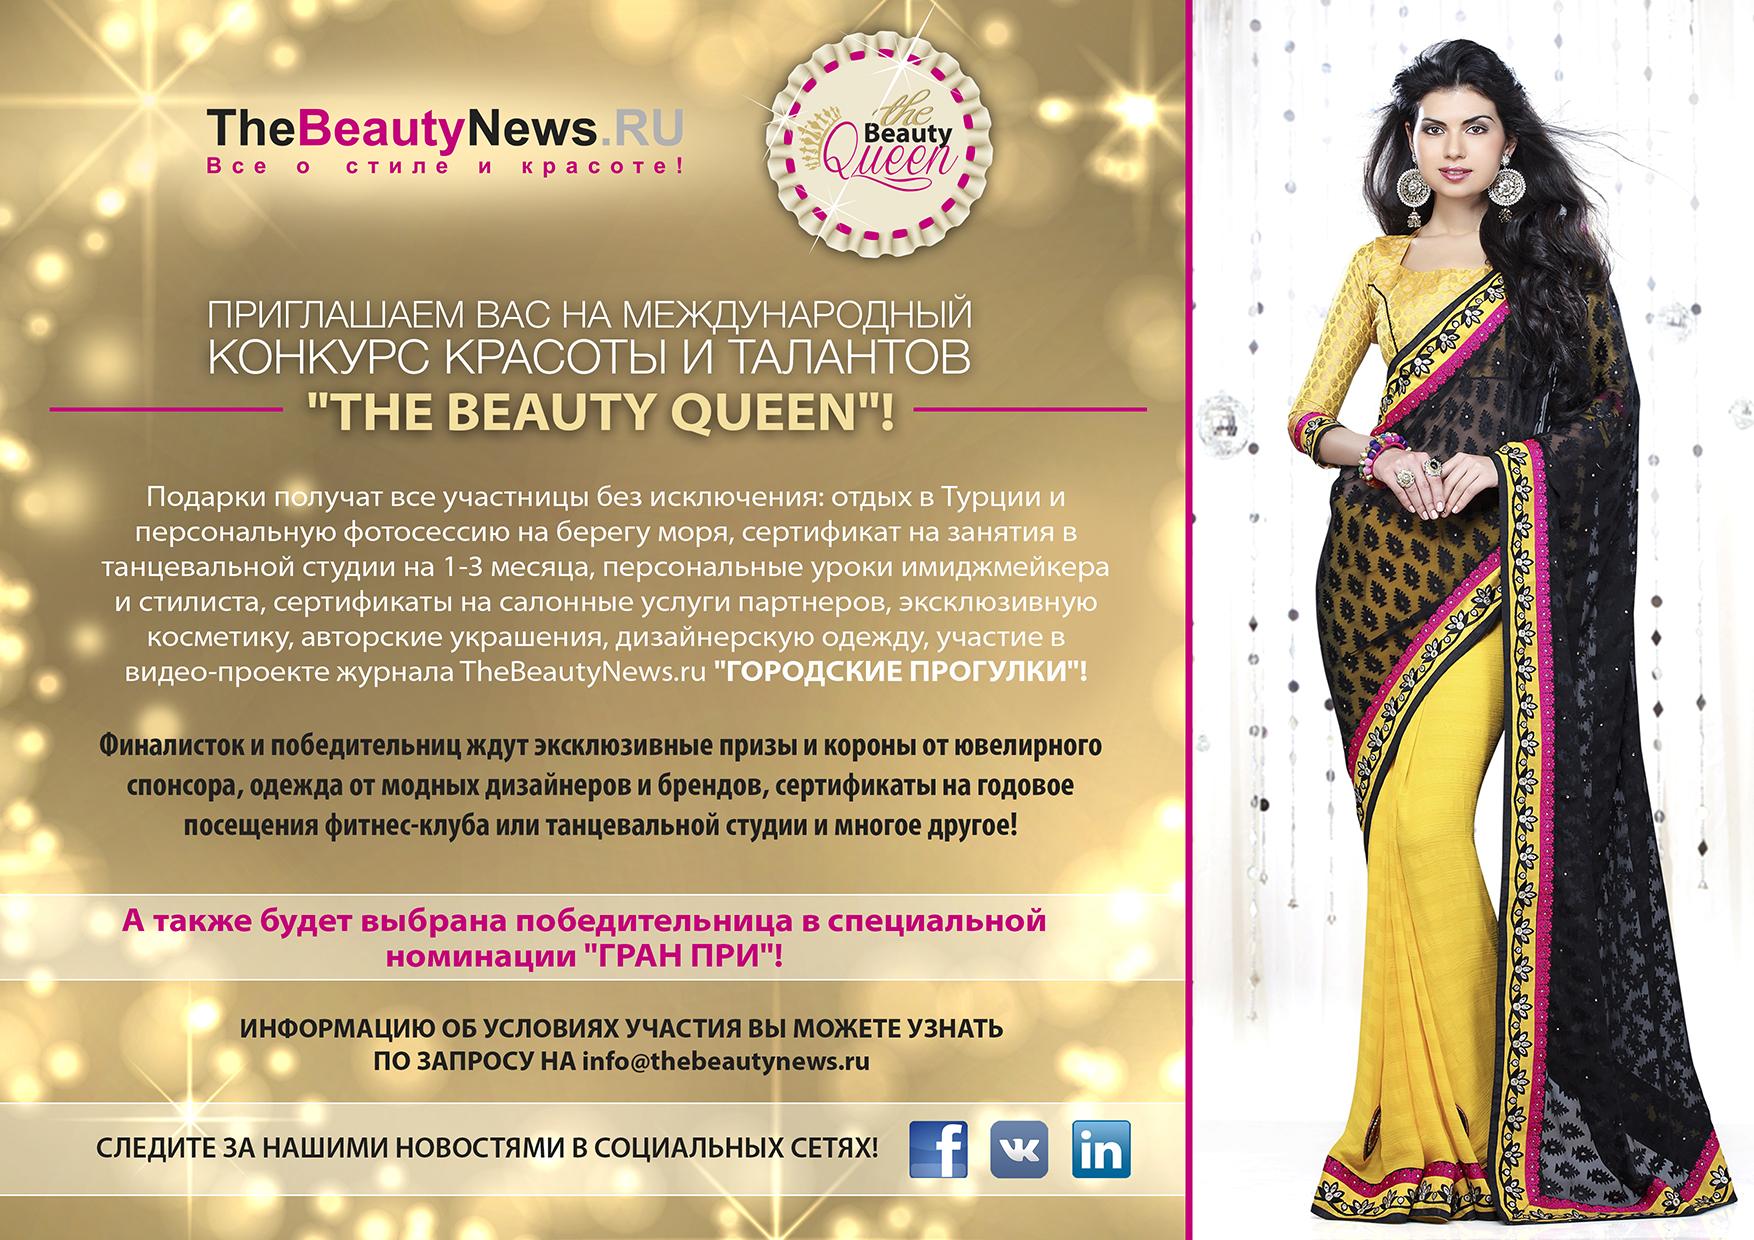 informative beauty contest